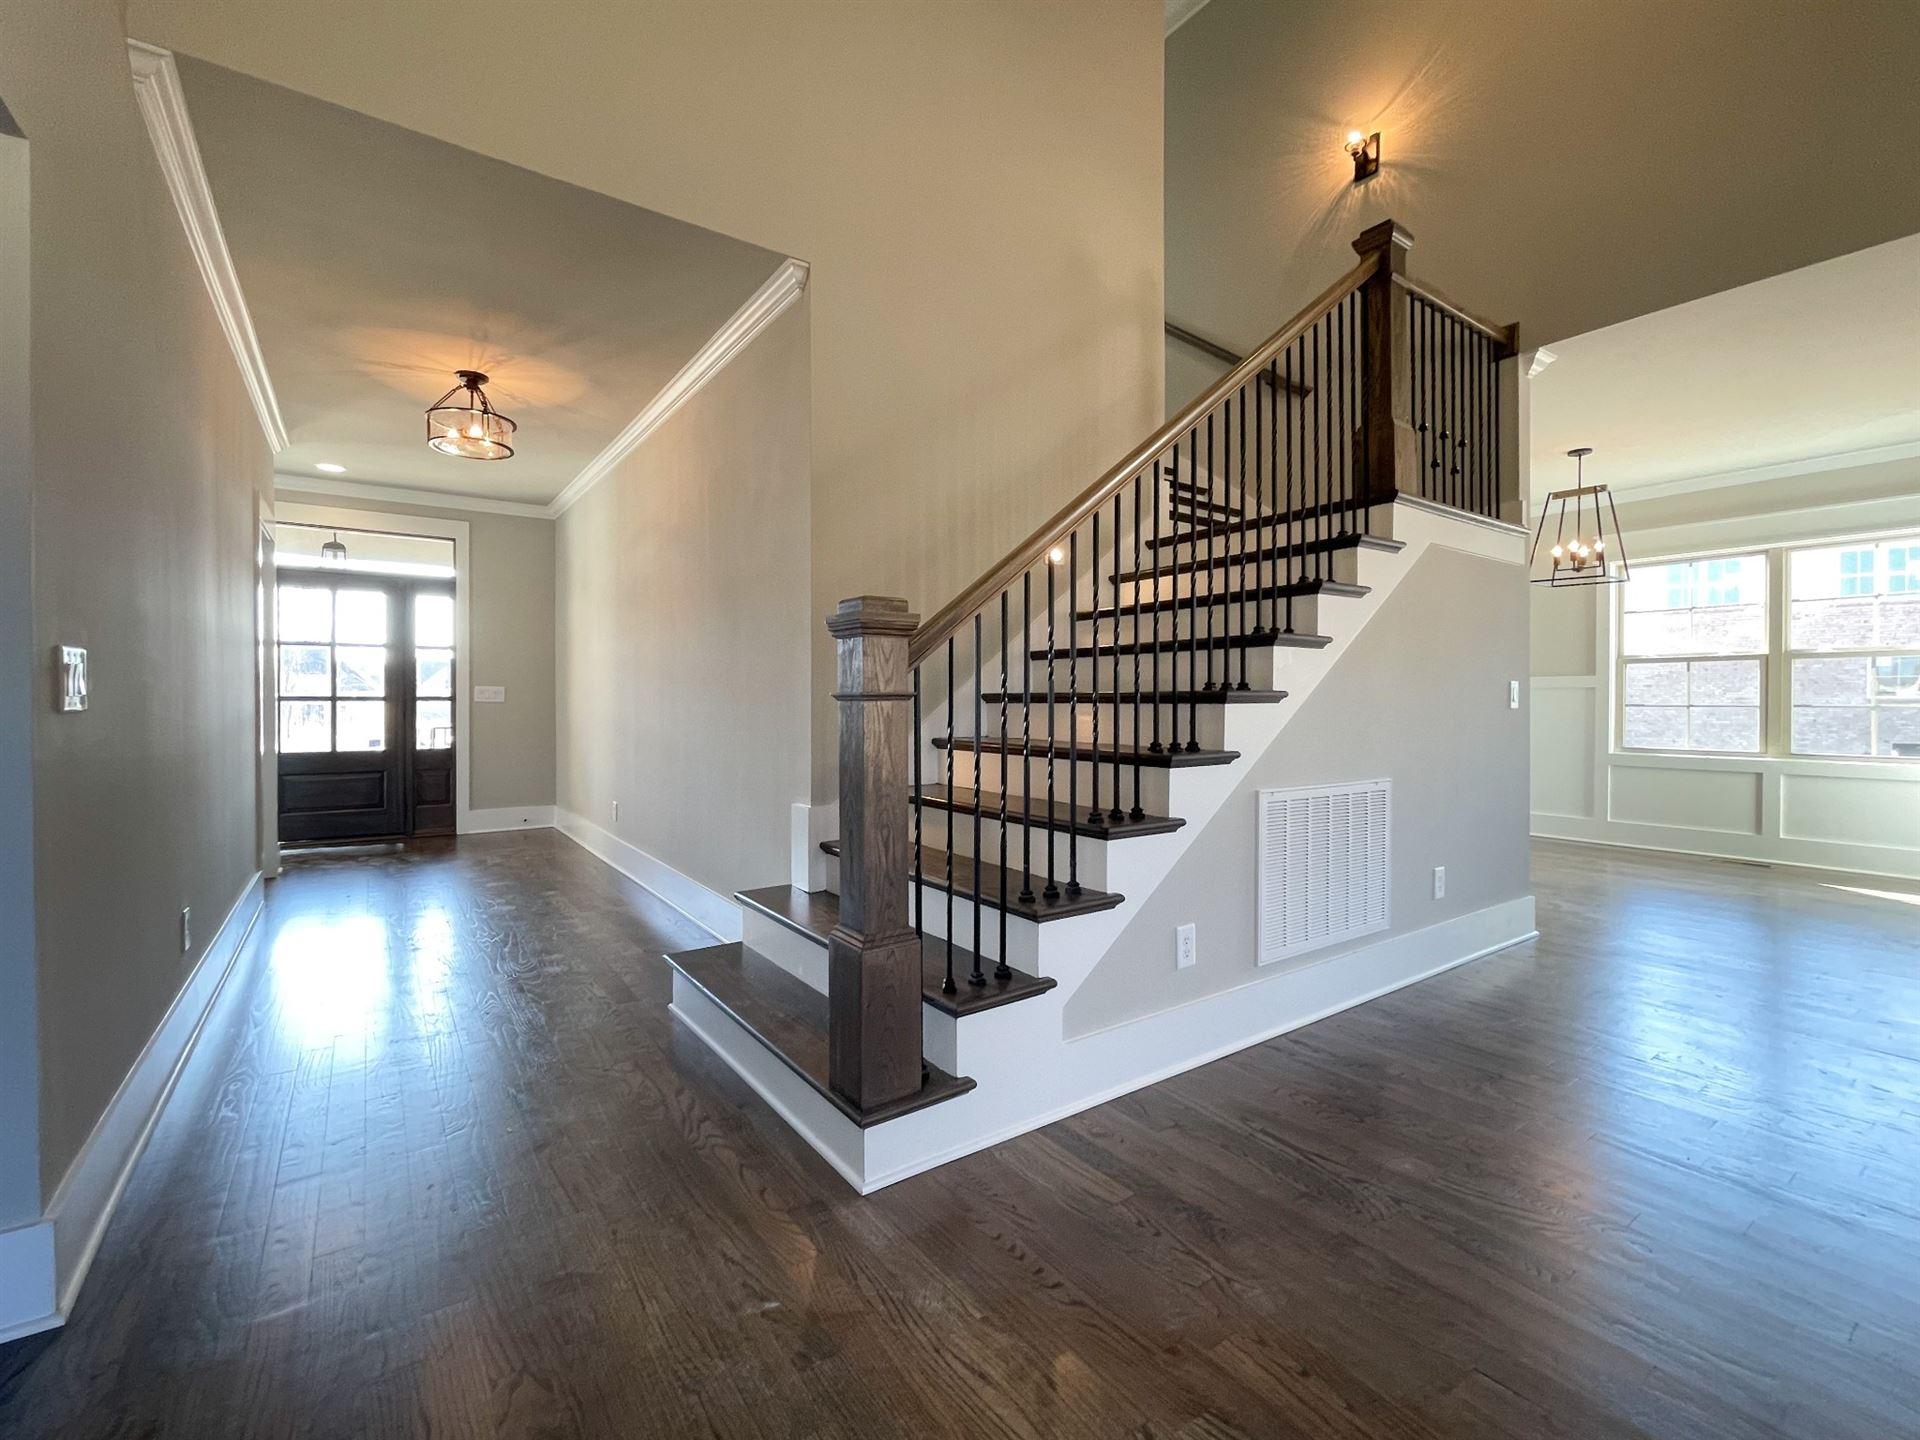 Photo of 1714 Sorrell Park Drive, Lot 42, Spring Hill, TN 37174 (MLS # 2299236)